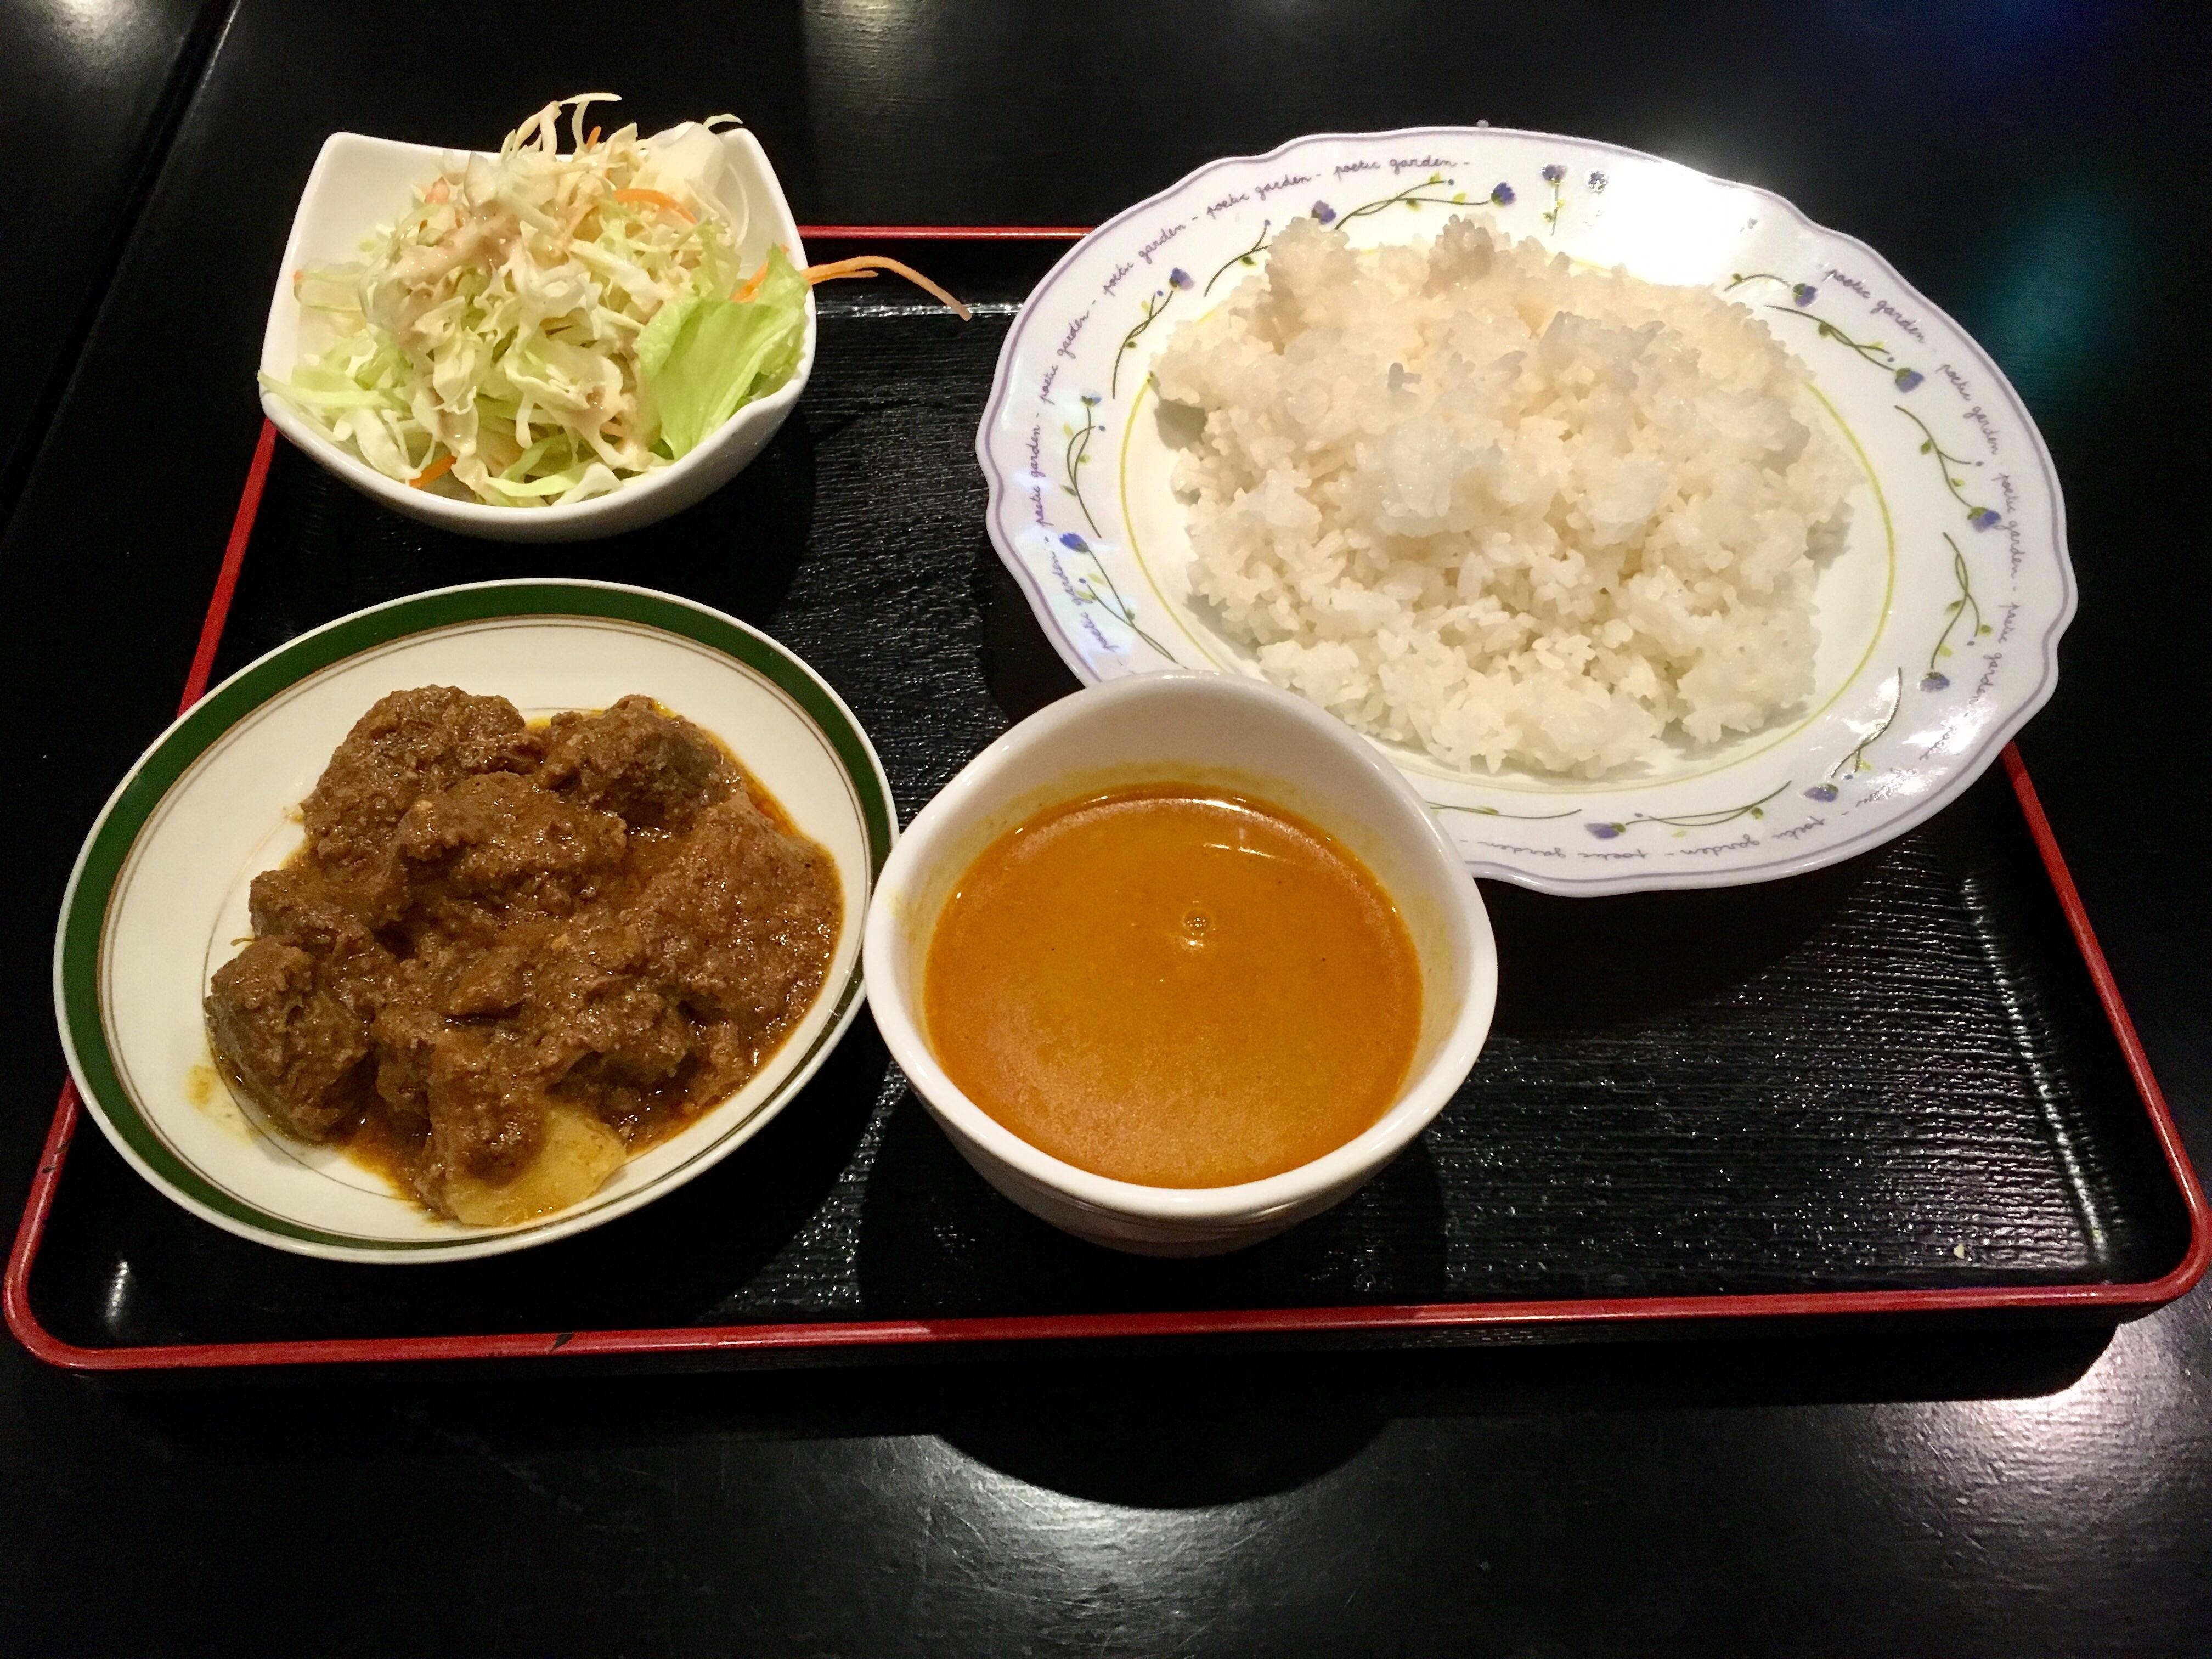 f:id:SoichiroIkeshita:20170123223918j:image